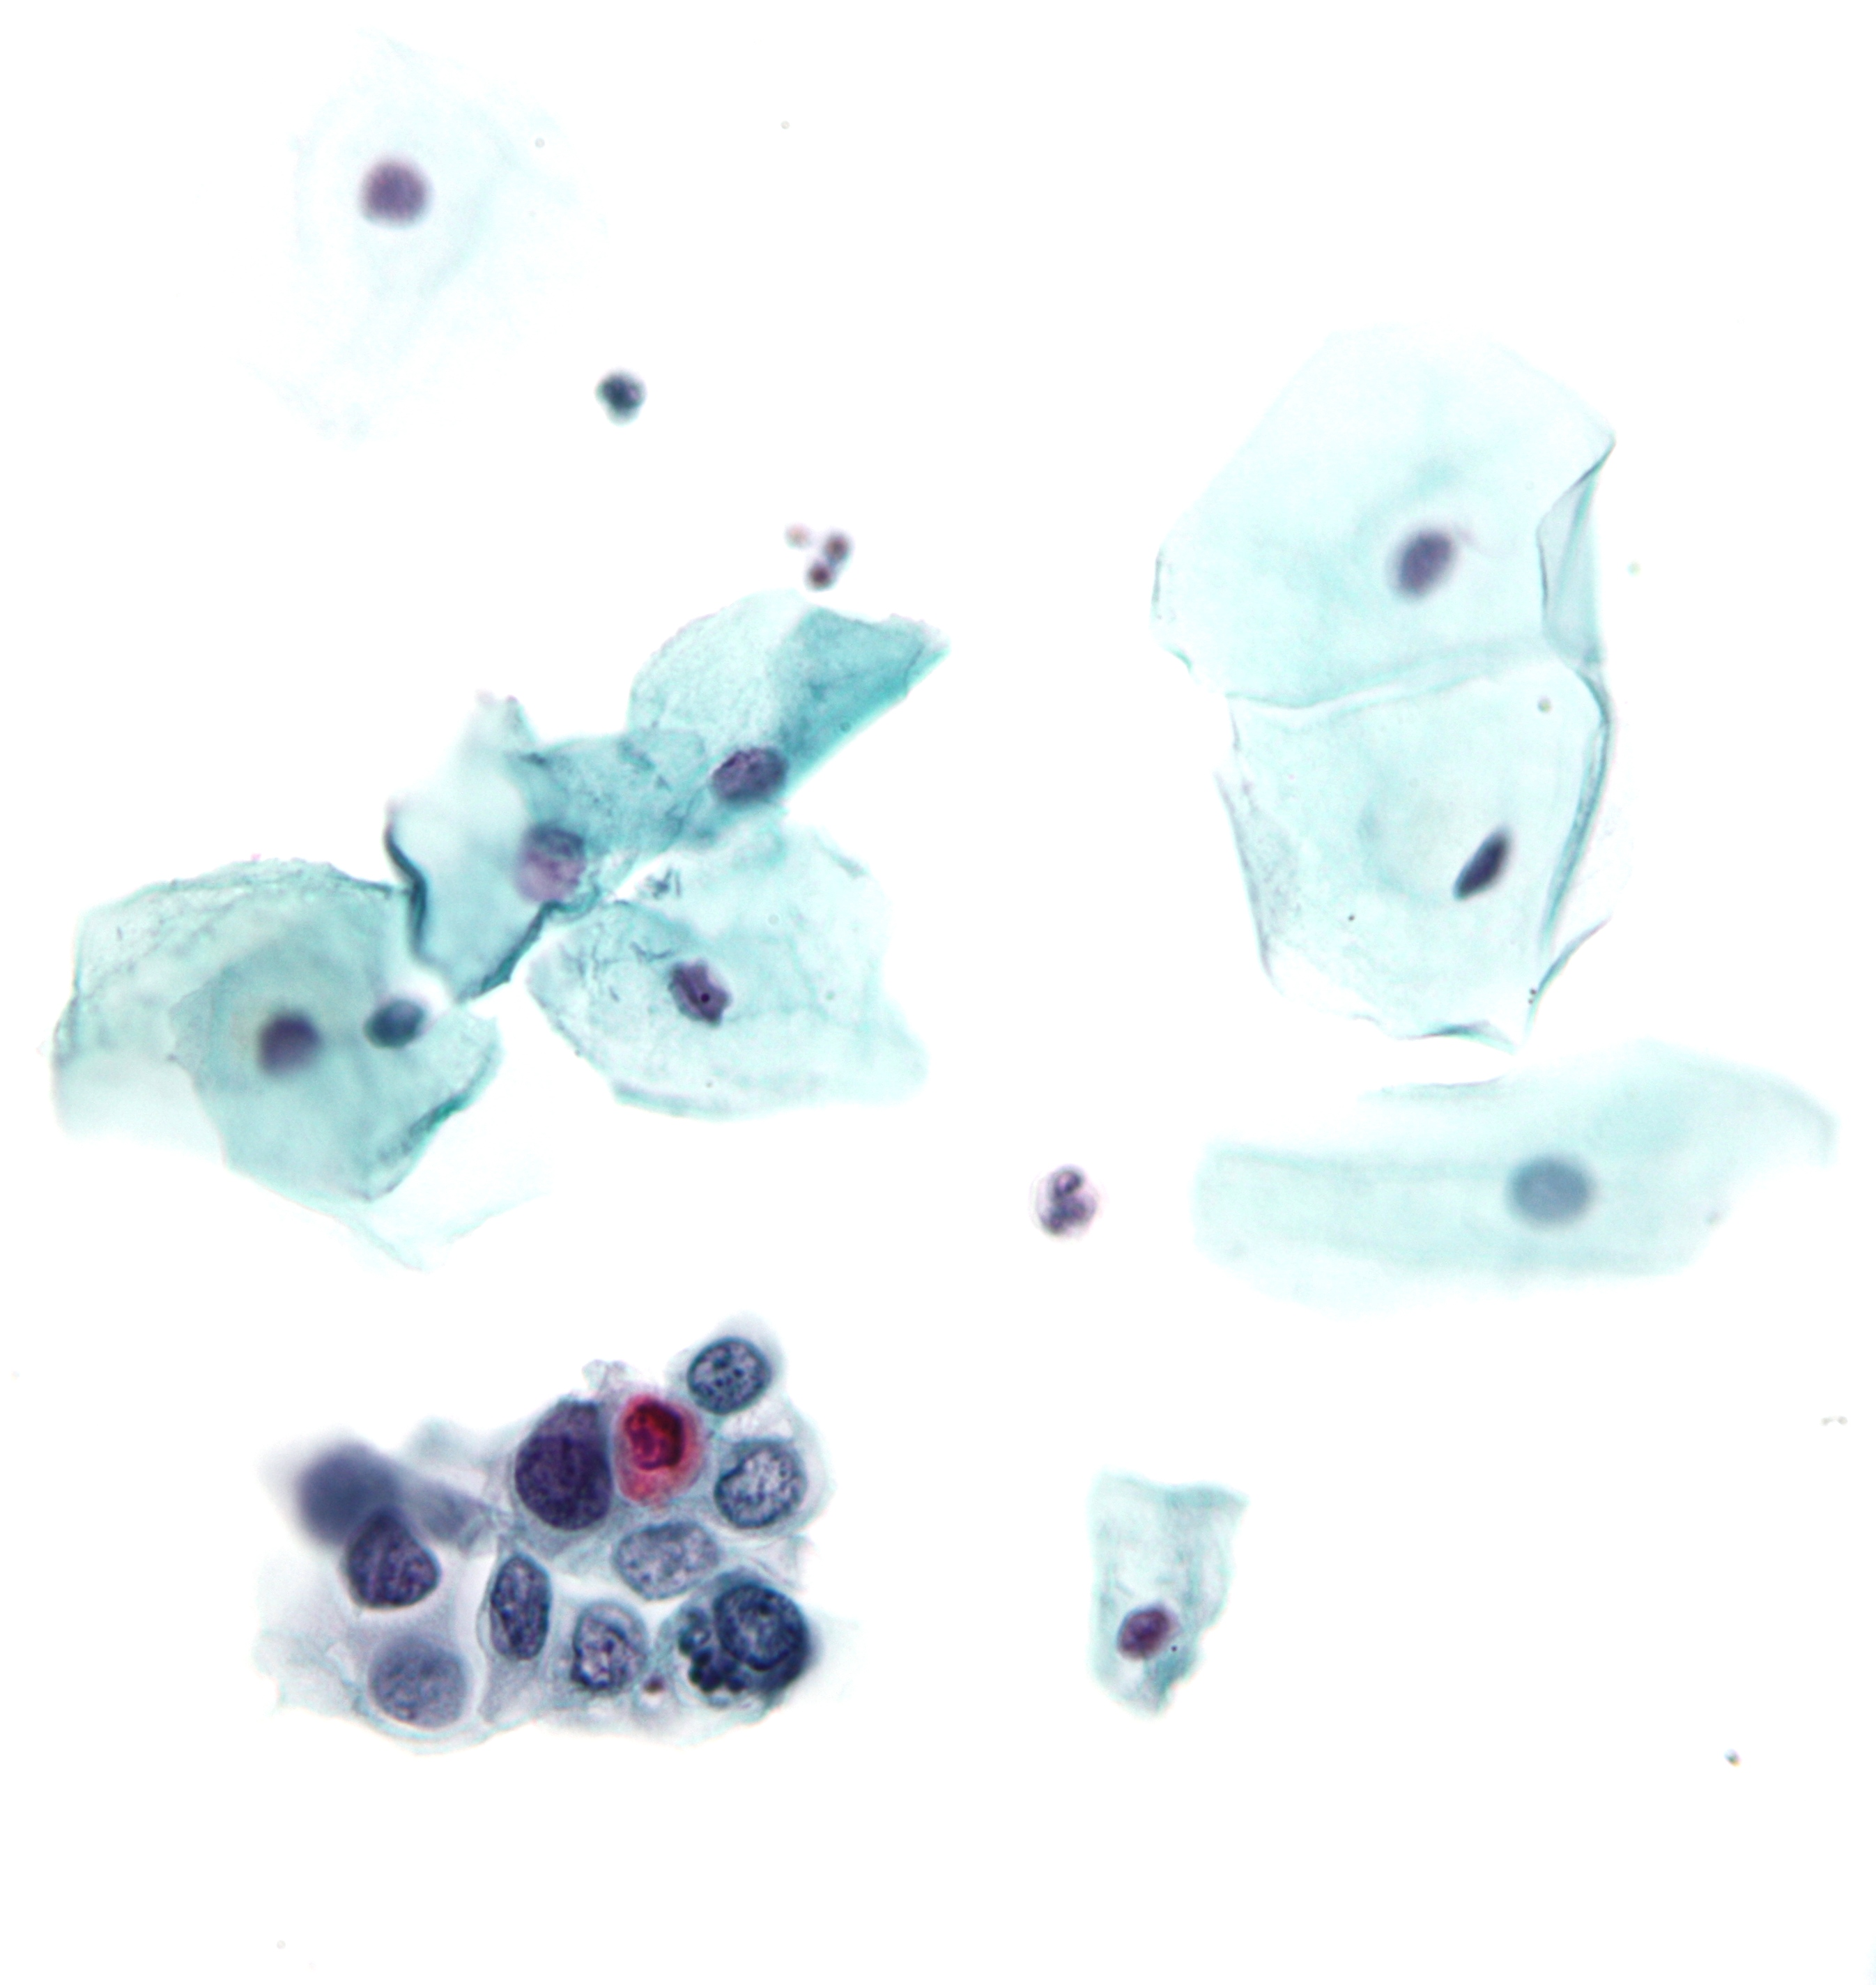 precancerous papilloma